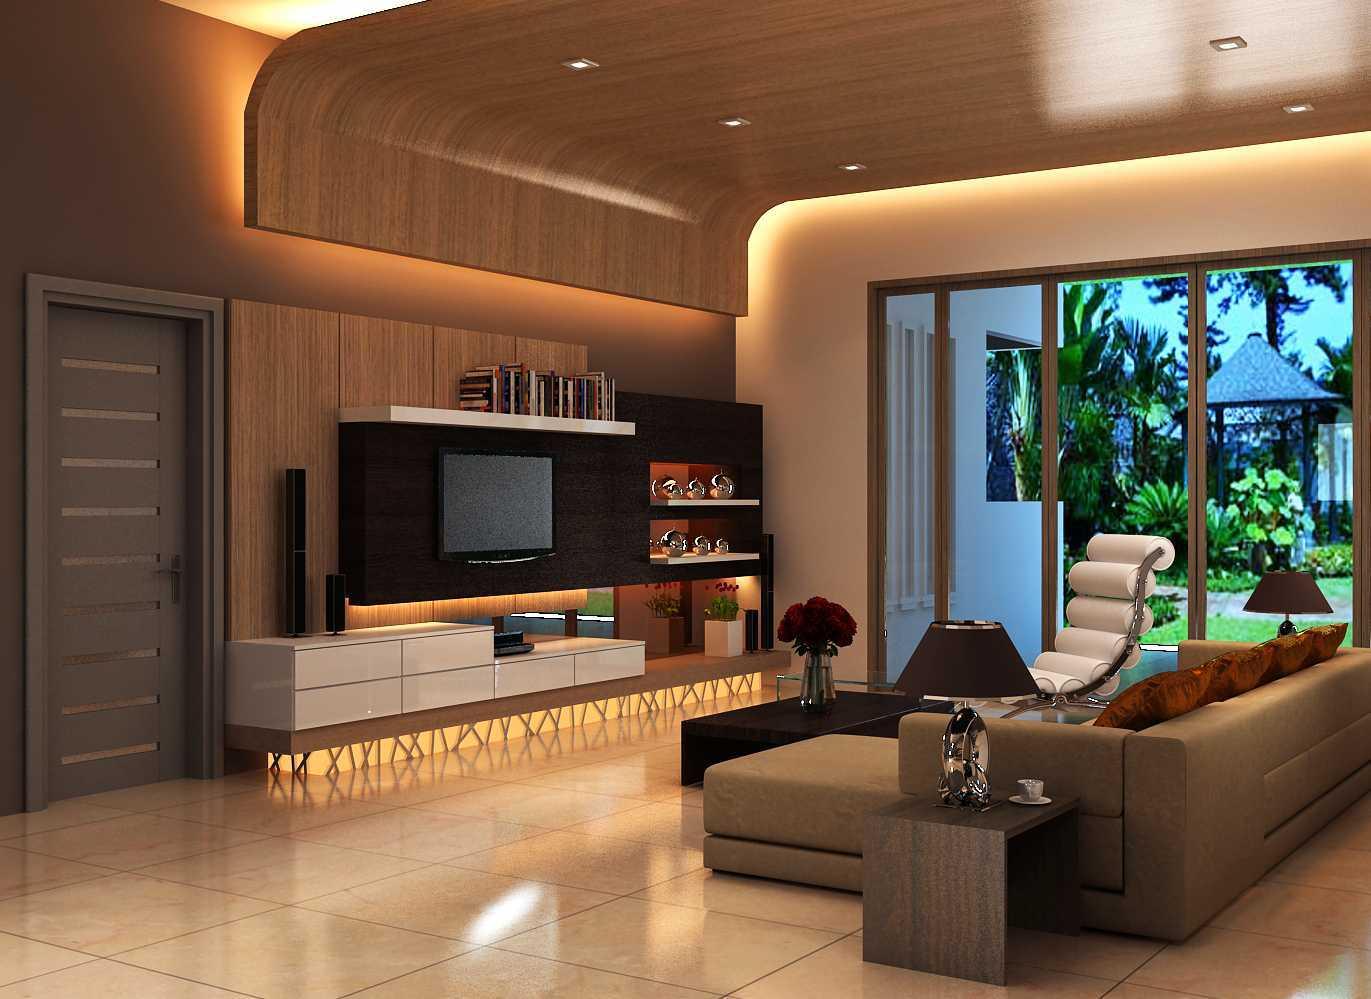 Donny Steven Massie Simply Elegant - Interior Design Bogor - Jawa Barat Bogor - Jawa Barat Living Minimalis  22481